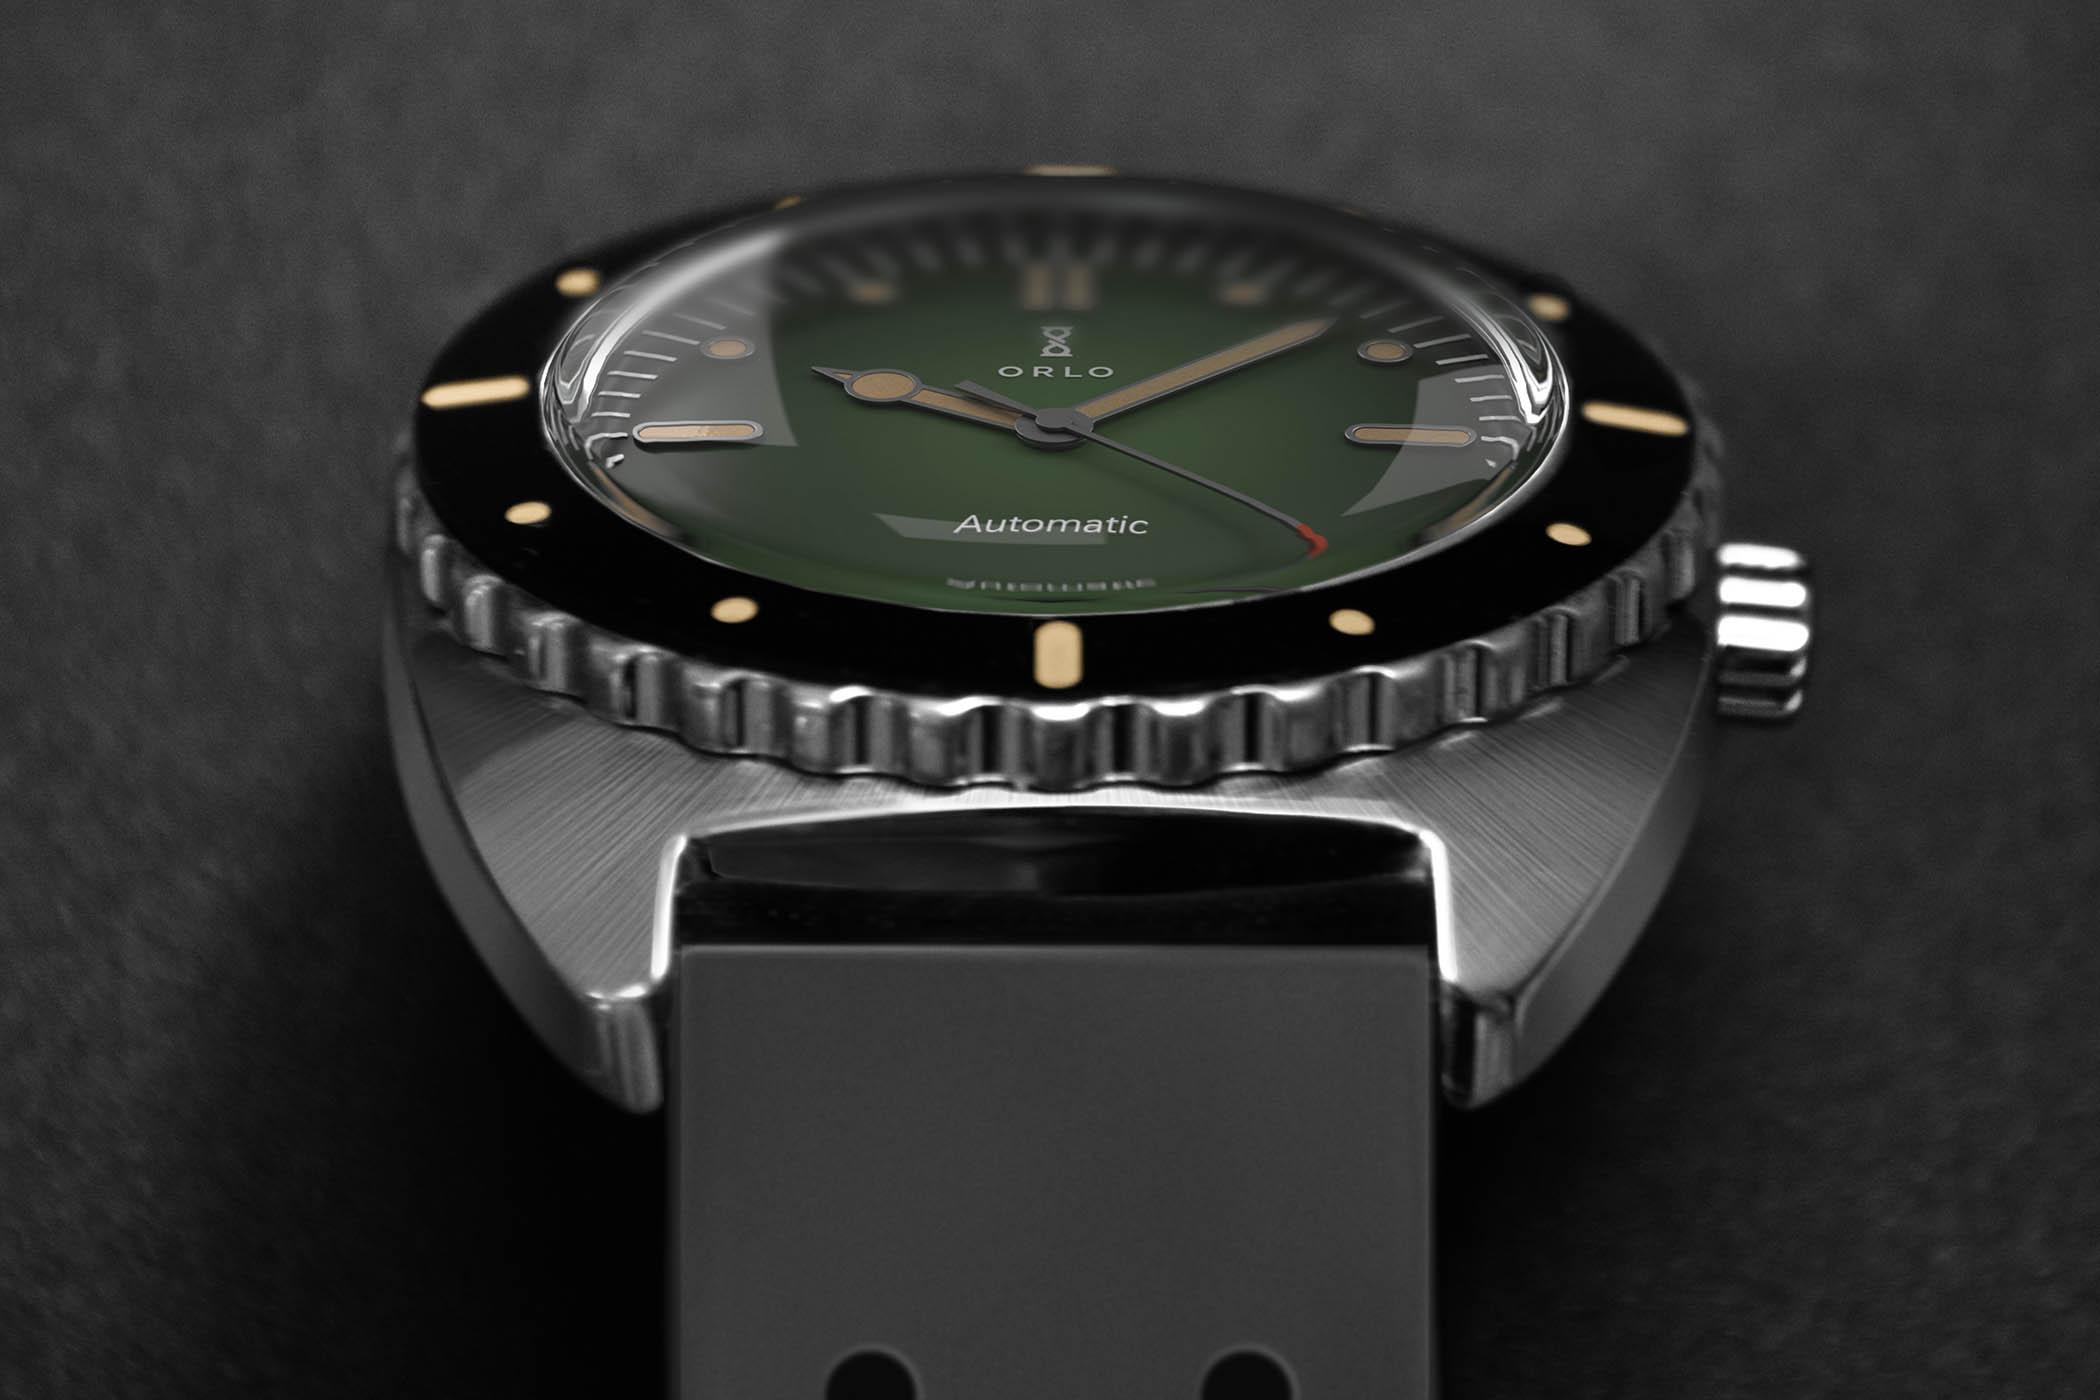 Orlo Ticonite Automatic Diver's Watch wth Scratchproof titanium case